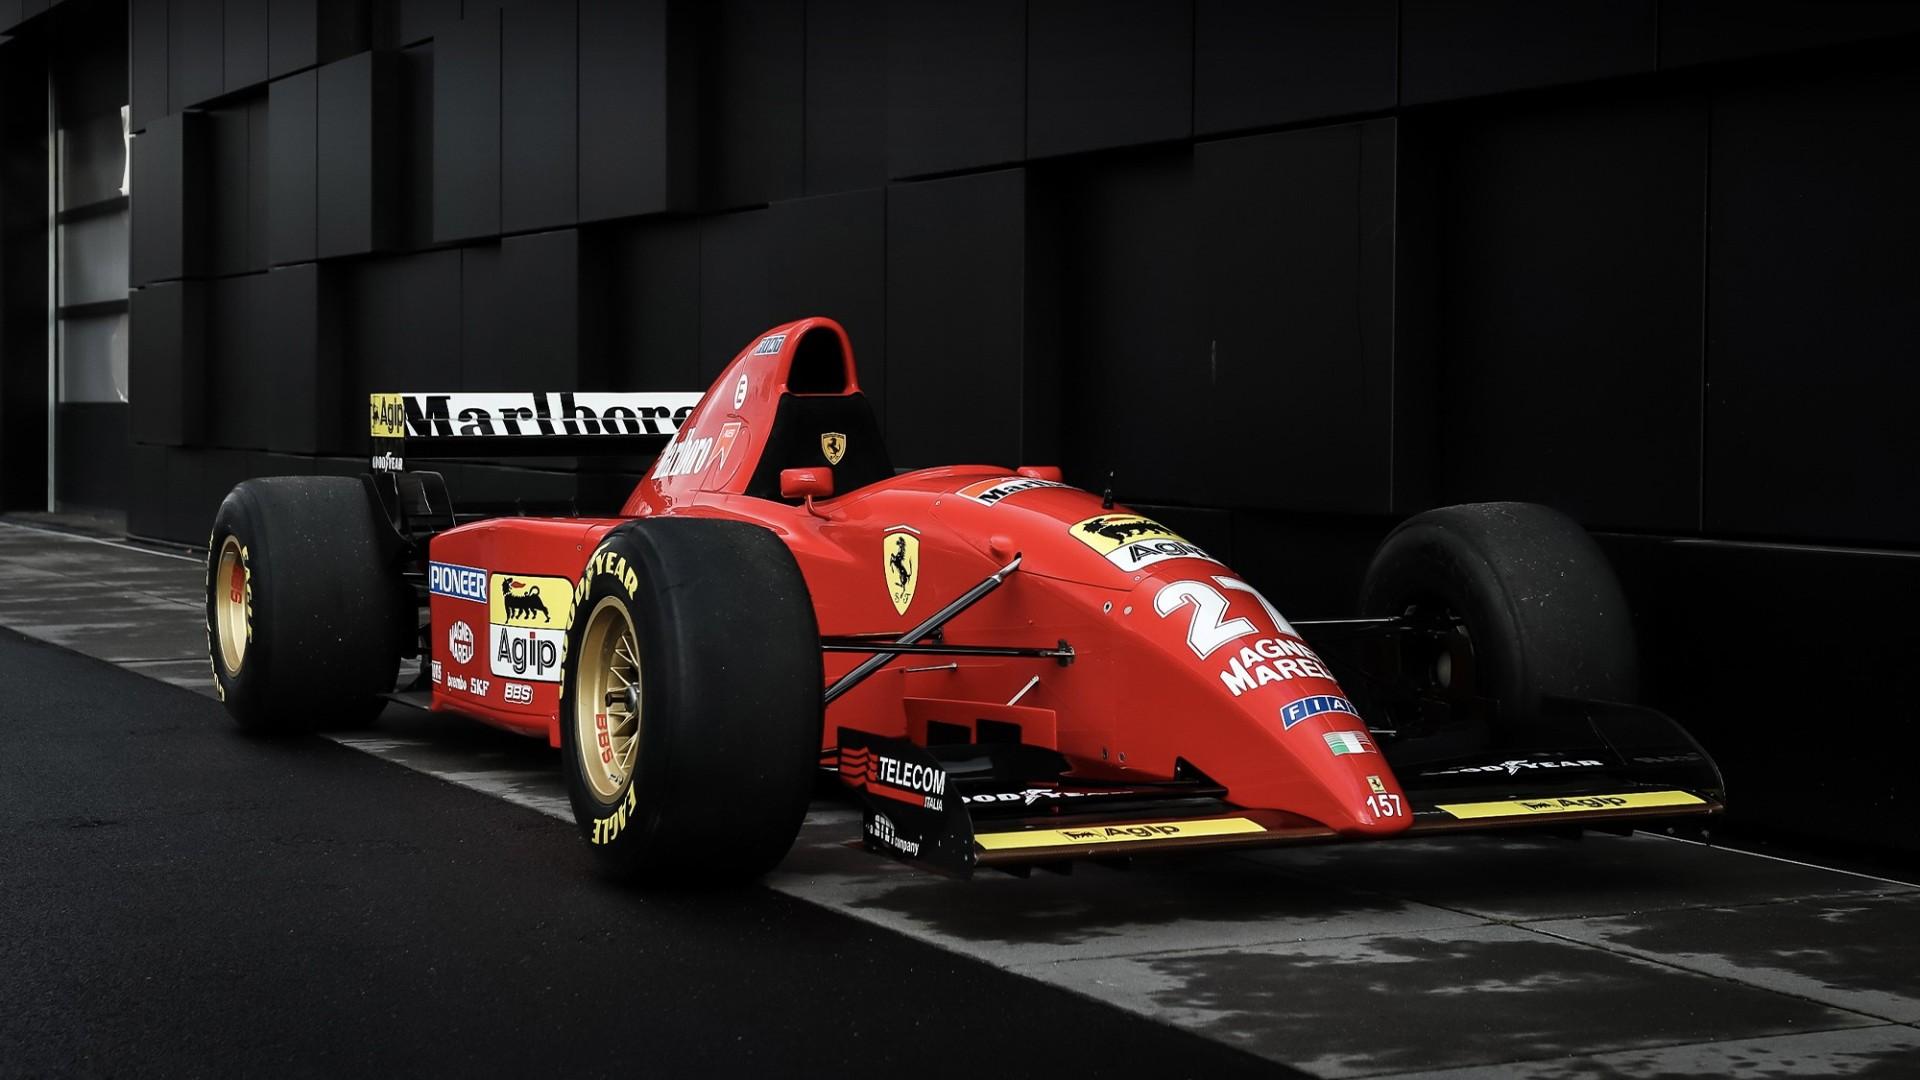 1995 Ferrari 412 T2 Michael Schumacher (1)